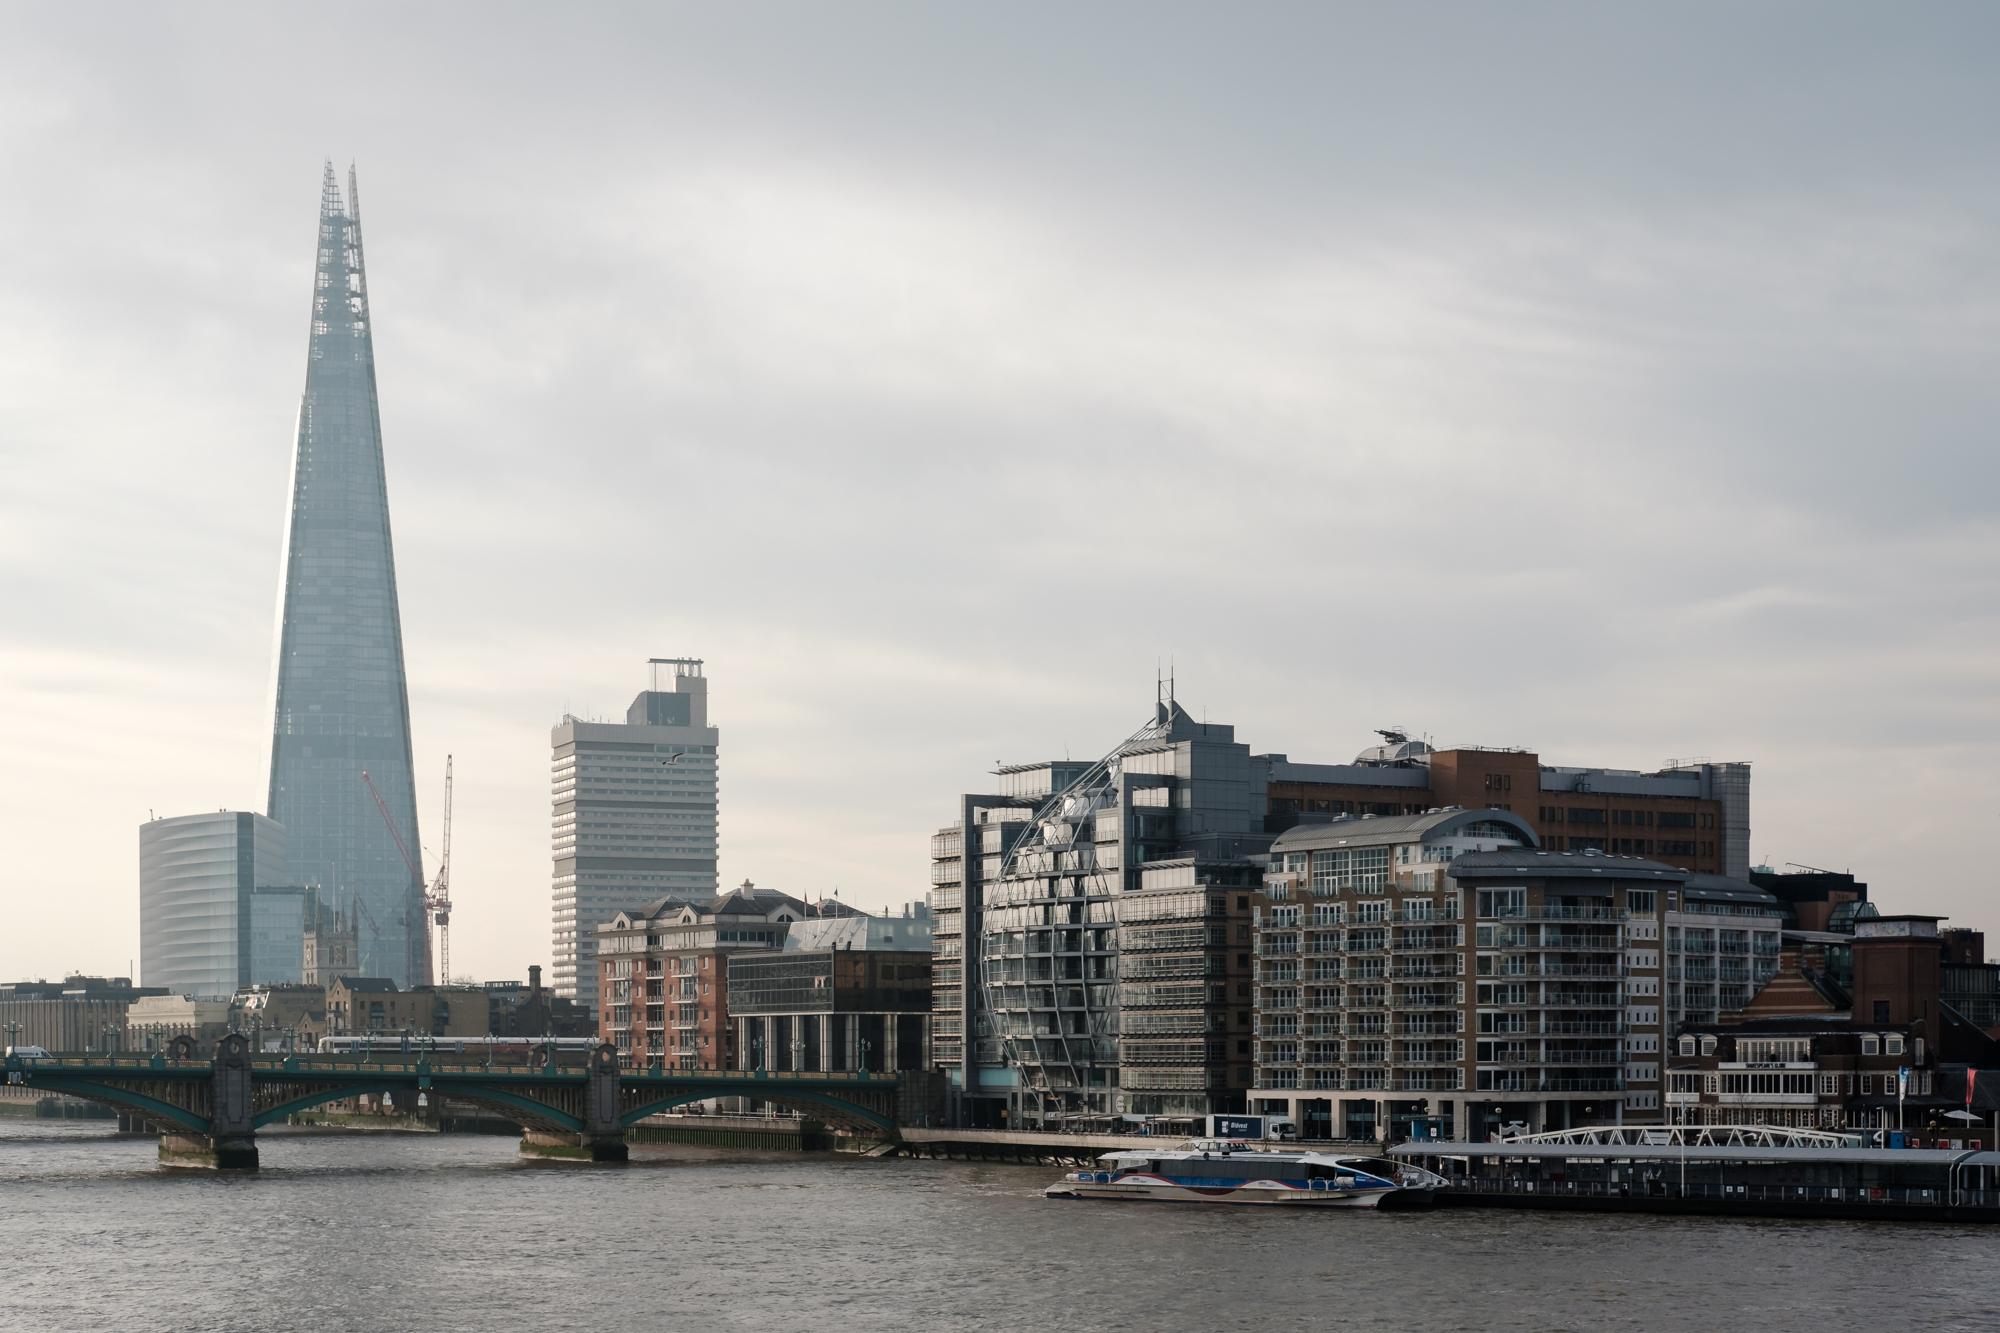 London Chrome photo the Shard along the Thames by Trevor Sherwin